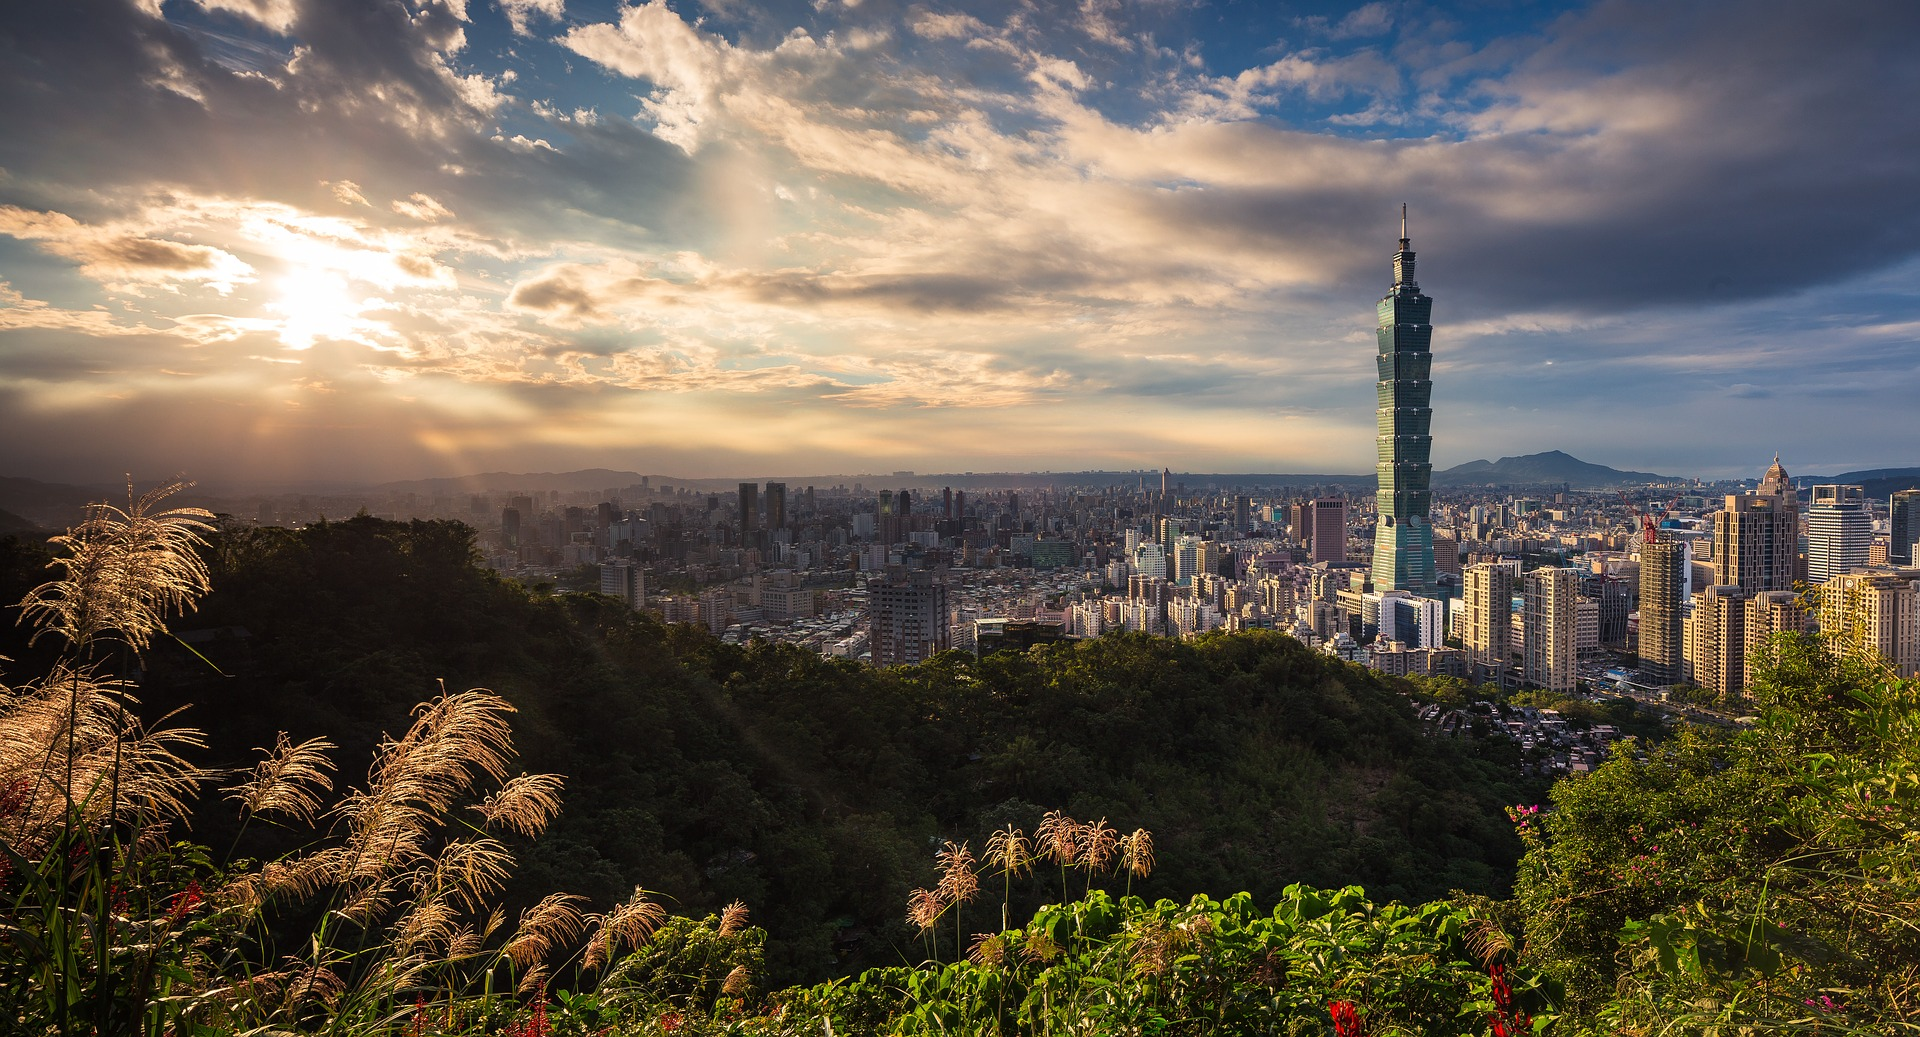 Taipei 101, Taiwan (By Pexels on Pixabay)